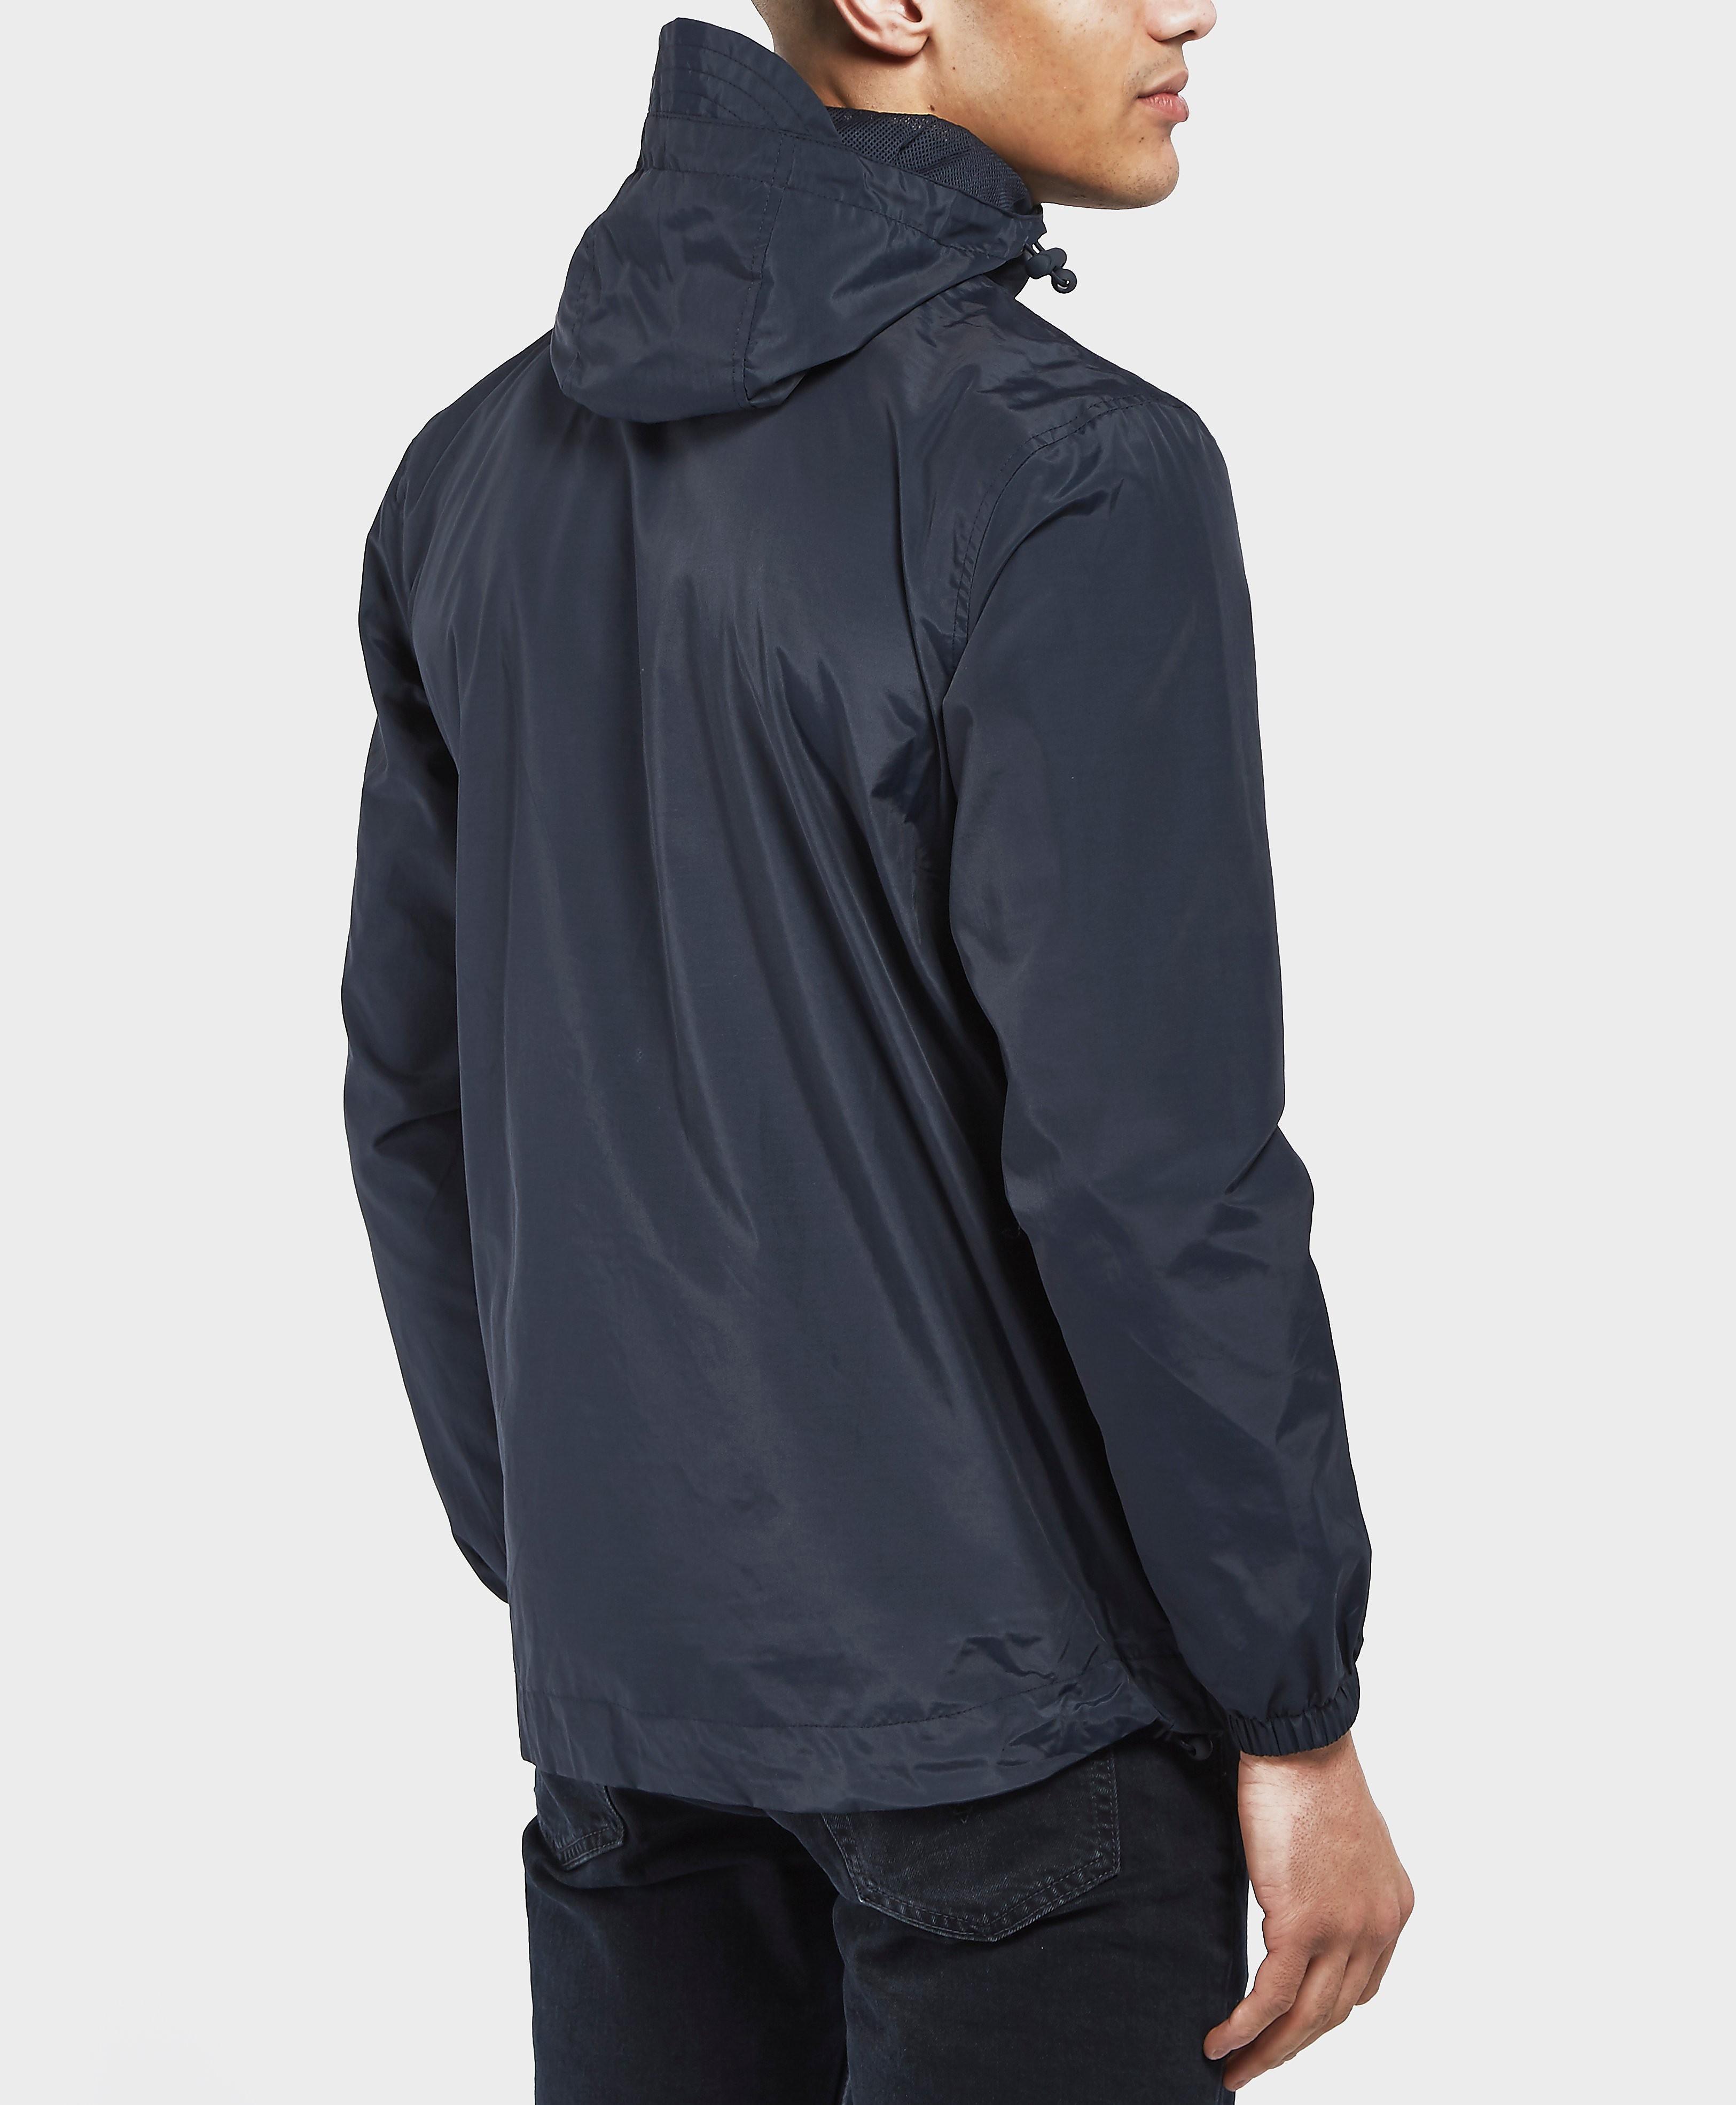 Lyle & Scott Zip Through Lightweight Hooded Jacket